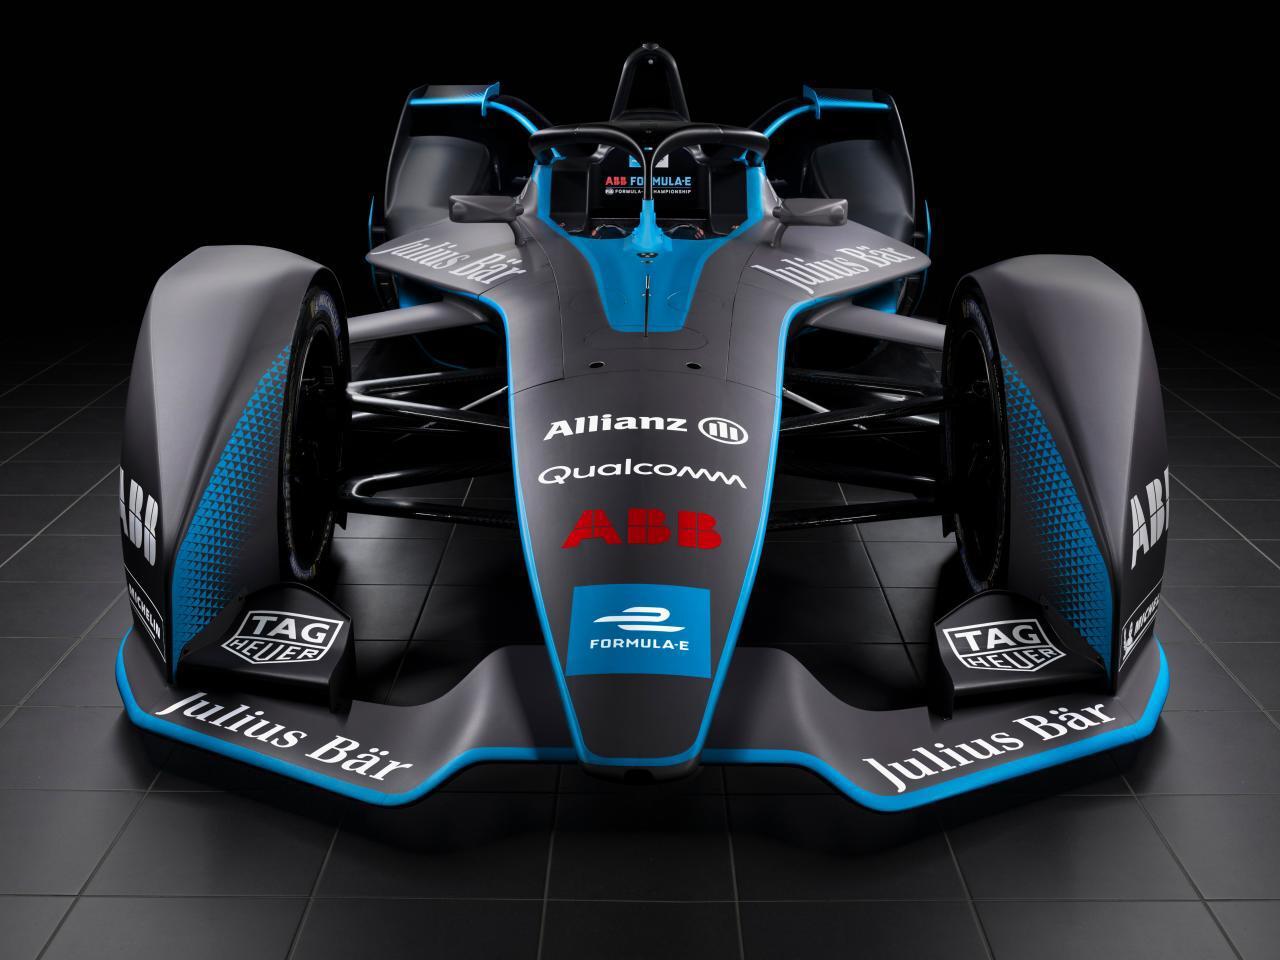 Bild zu Formel E ab 2018/2019